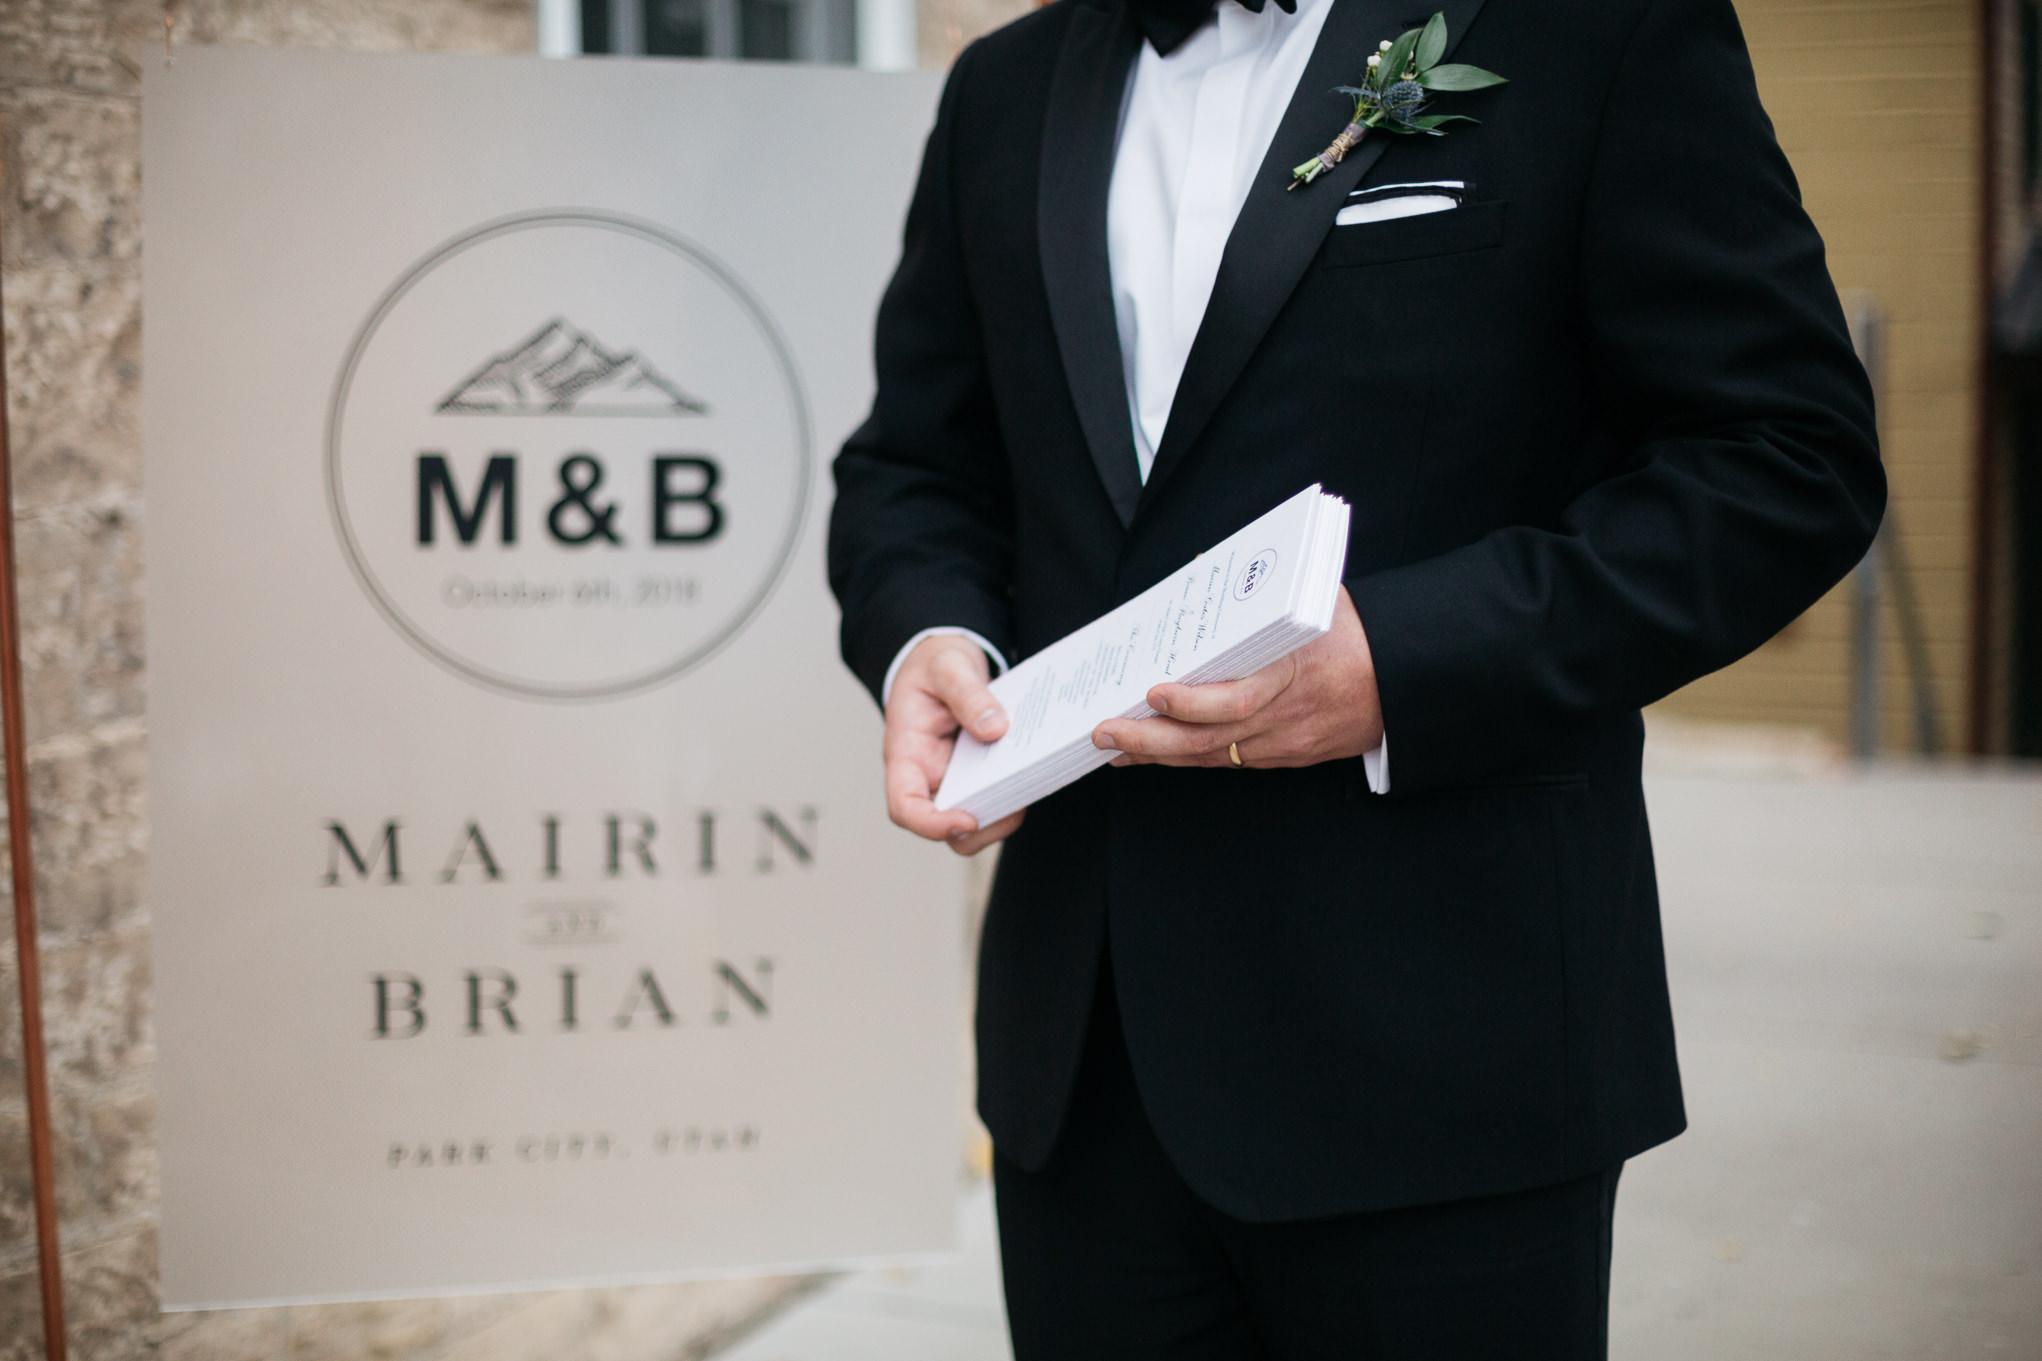 357_ONL_Mairin_Brian_Wedding_Trevor_Hooper_Photo.jpg